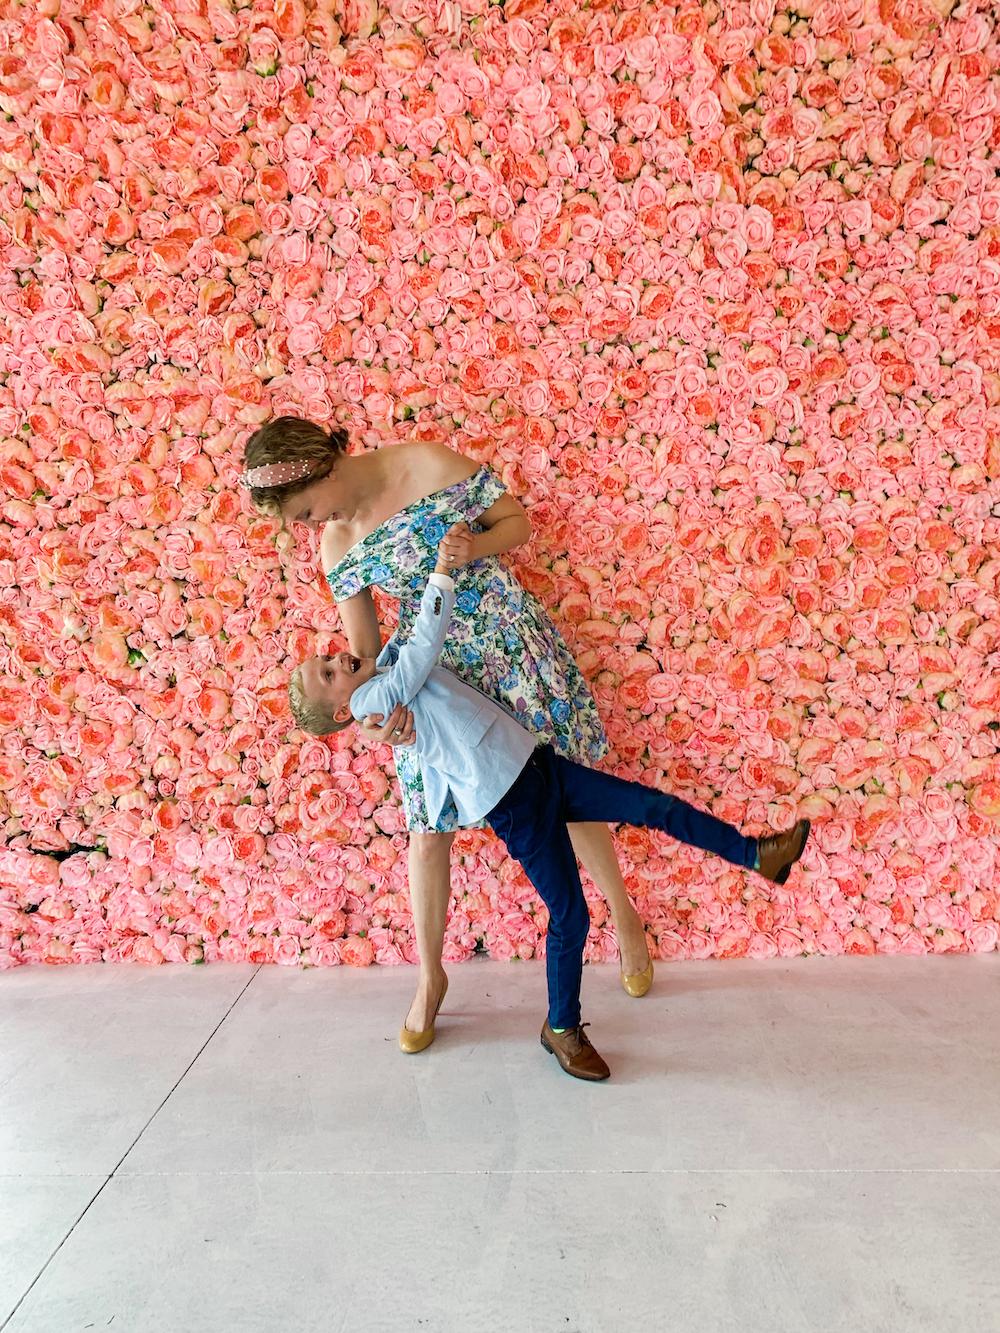 Austin flower vault, Austin mural, Austin wall mural, domain Austin, domain Austin flower vault, flower vault domain, mommy and me, mommy and me date, Austin family, Austin mom, Austin mom blog, Austin mom blogger, round rock blogger, round rock Texas blogger, Georgetown Texas blogger, Georgetown Texas mom blogger, Texas mom blogger, kids prom date, round rock Texas mom blogger, domain Austin, H&M kids suit, Jesse Coulter blog, Jesse Coulter blogger, Austin family photographer